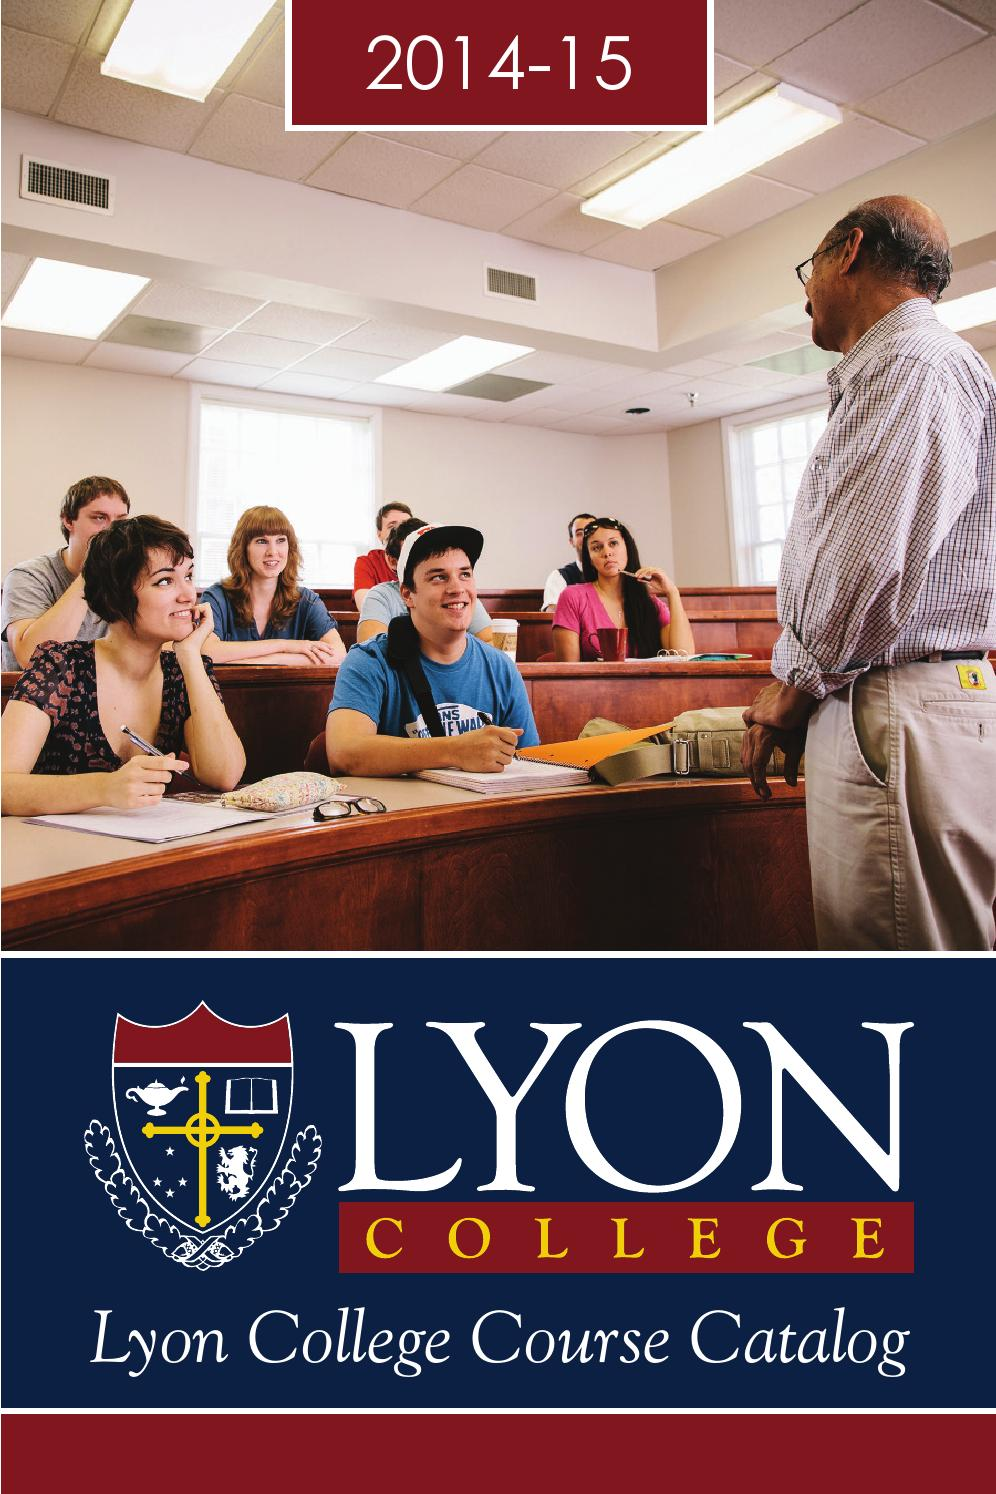 Lyon catalog 2014 15 by Lyon College - issuu